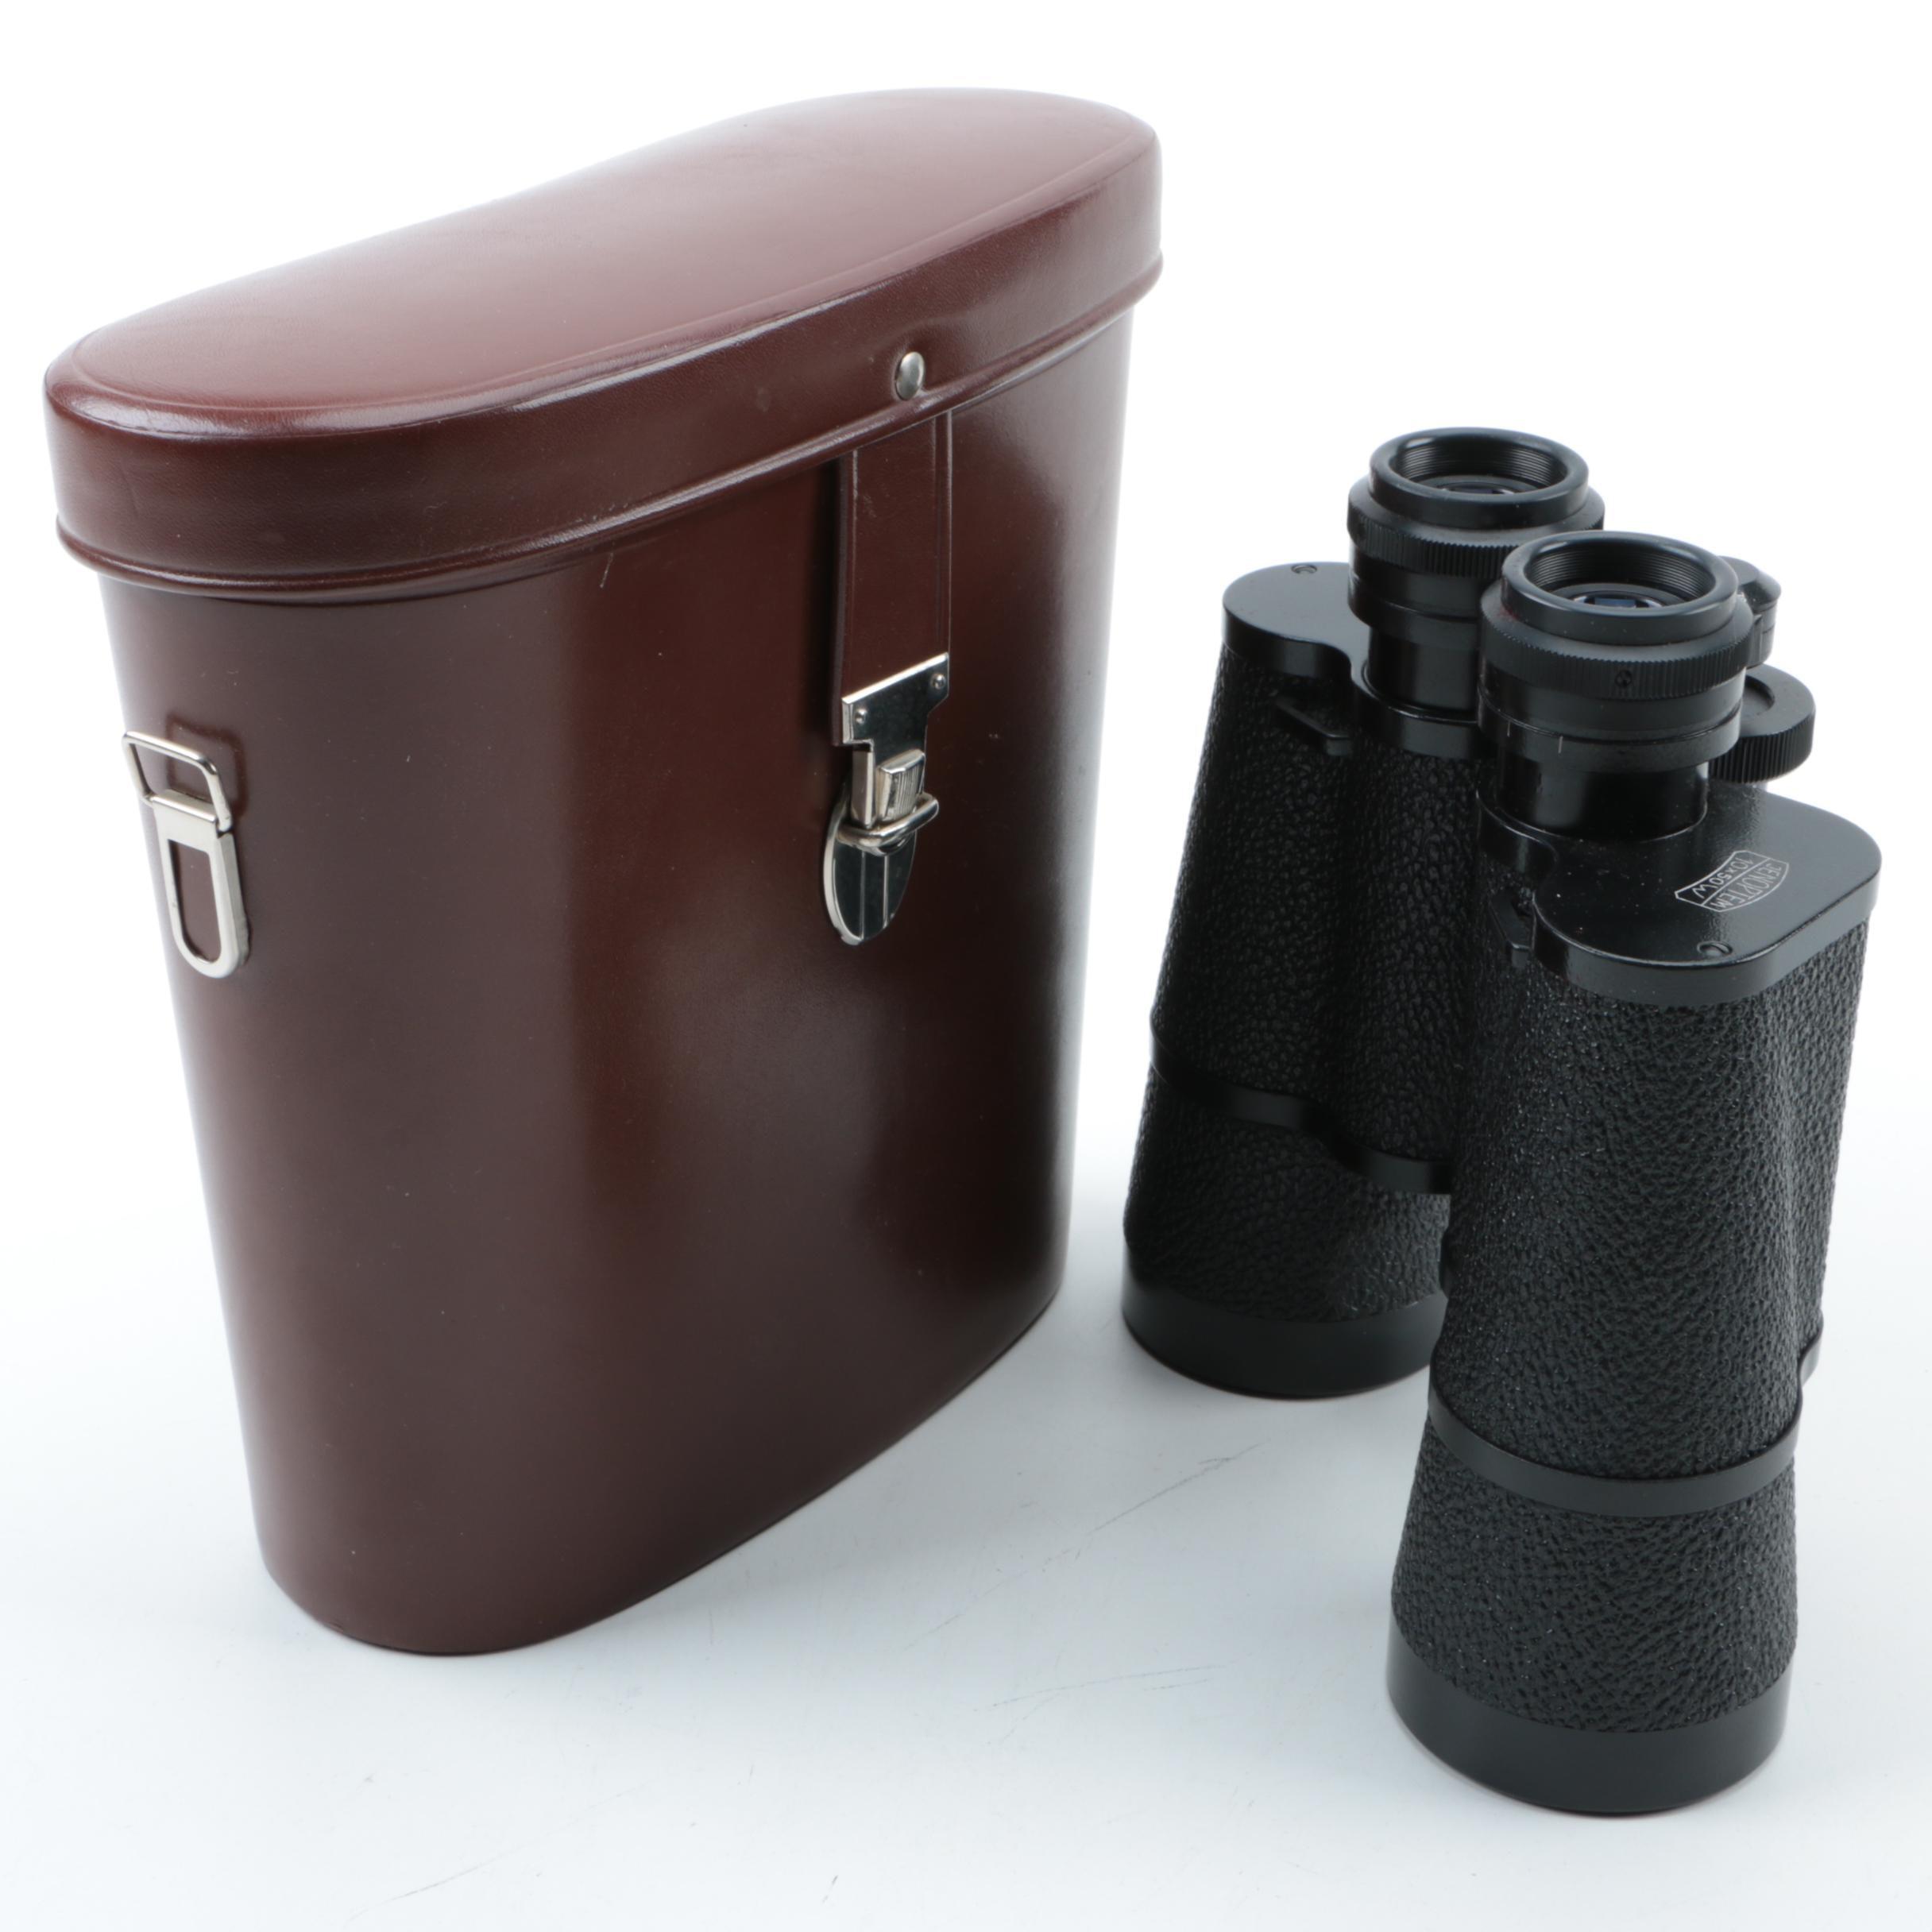 Vintage Carl Zeiss Jena 10x50W Jenoptem Binoculars with Case